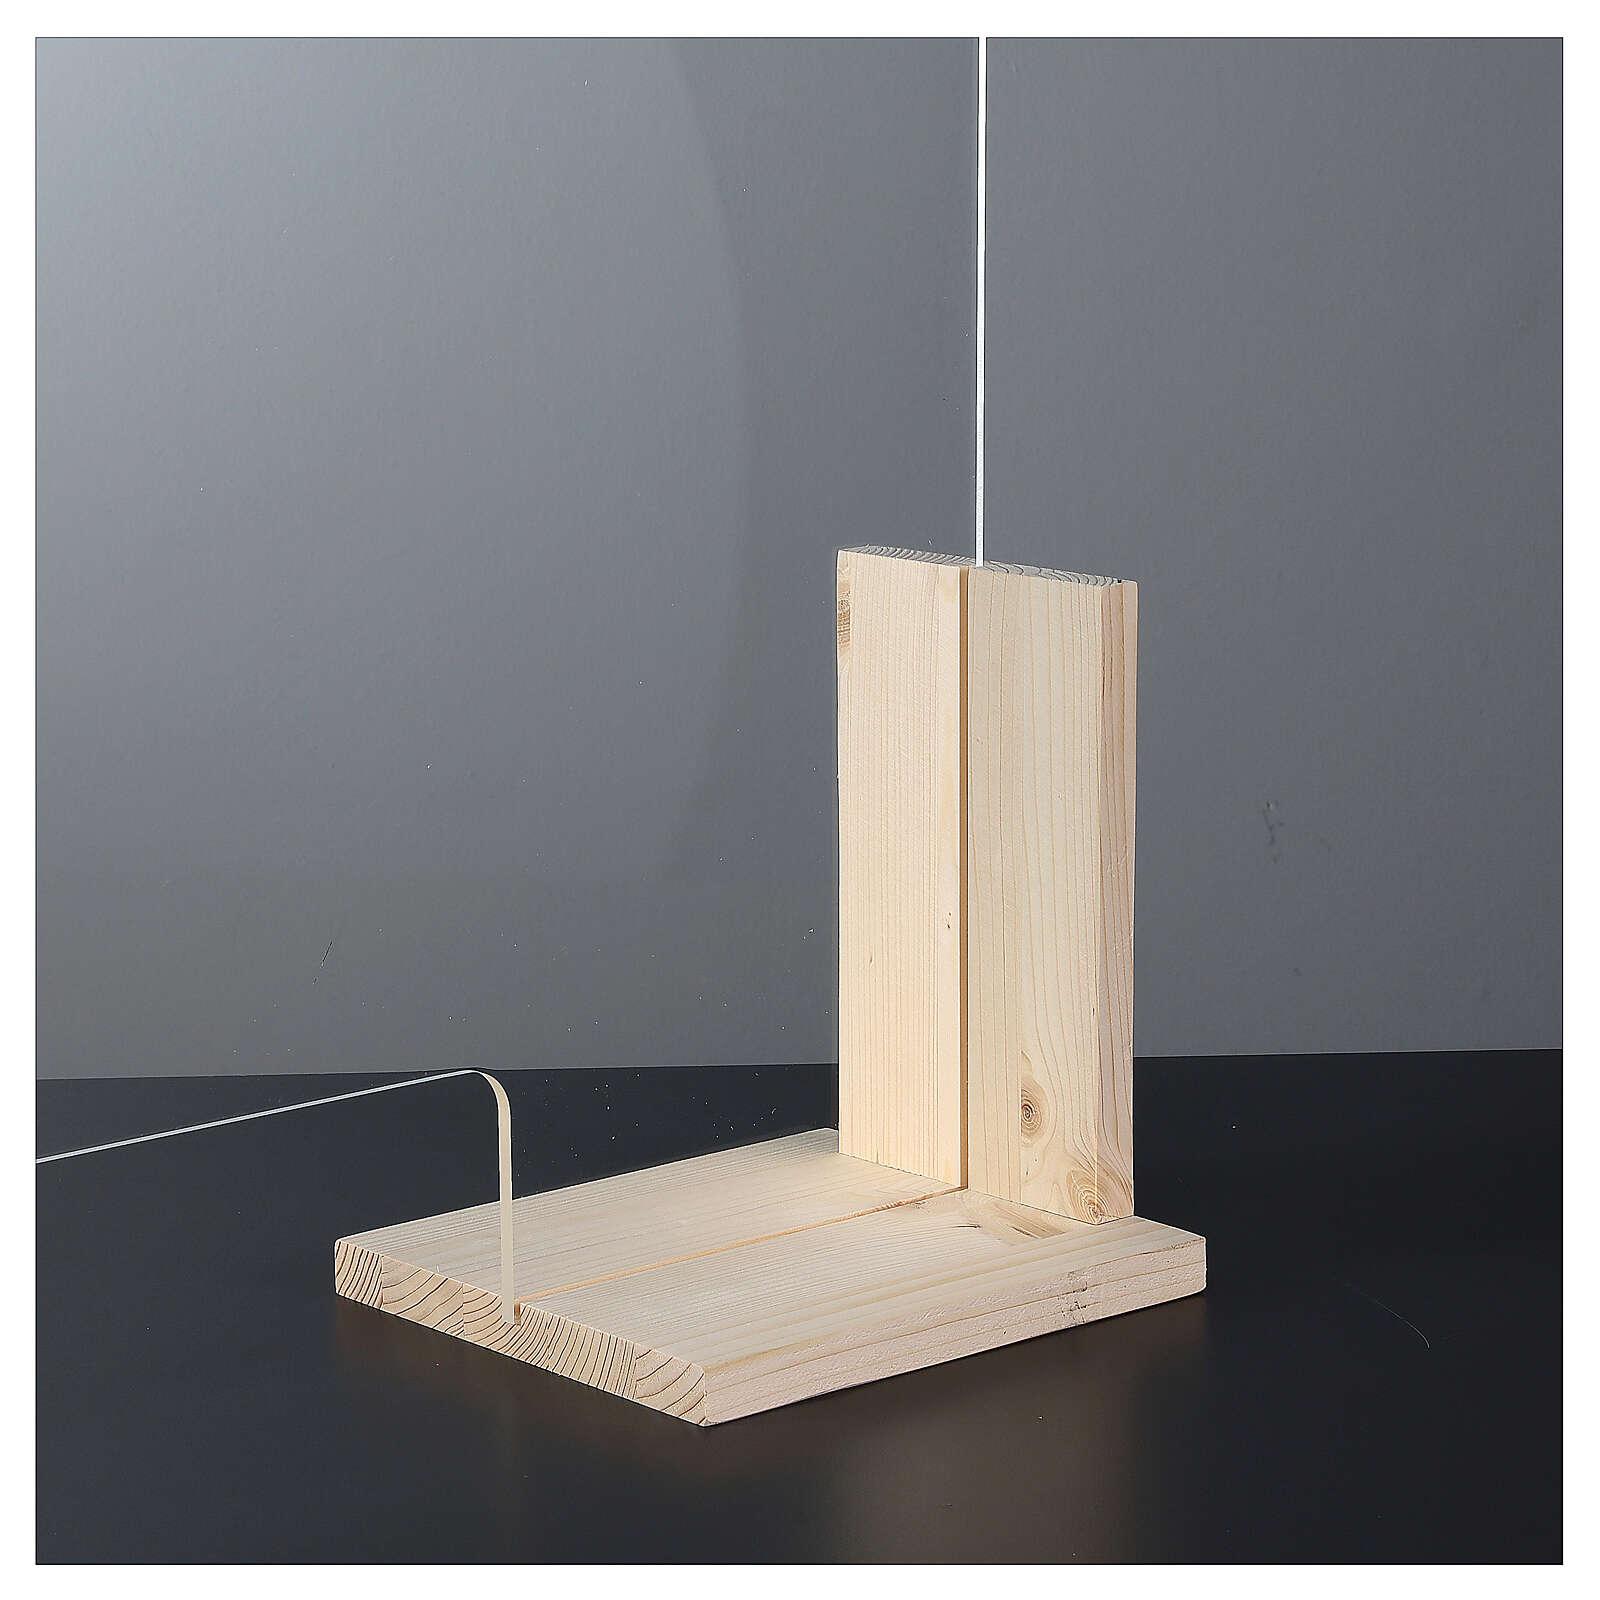 Parafiato Design Wood h 65x95 - finestra h 8x32 3